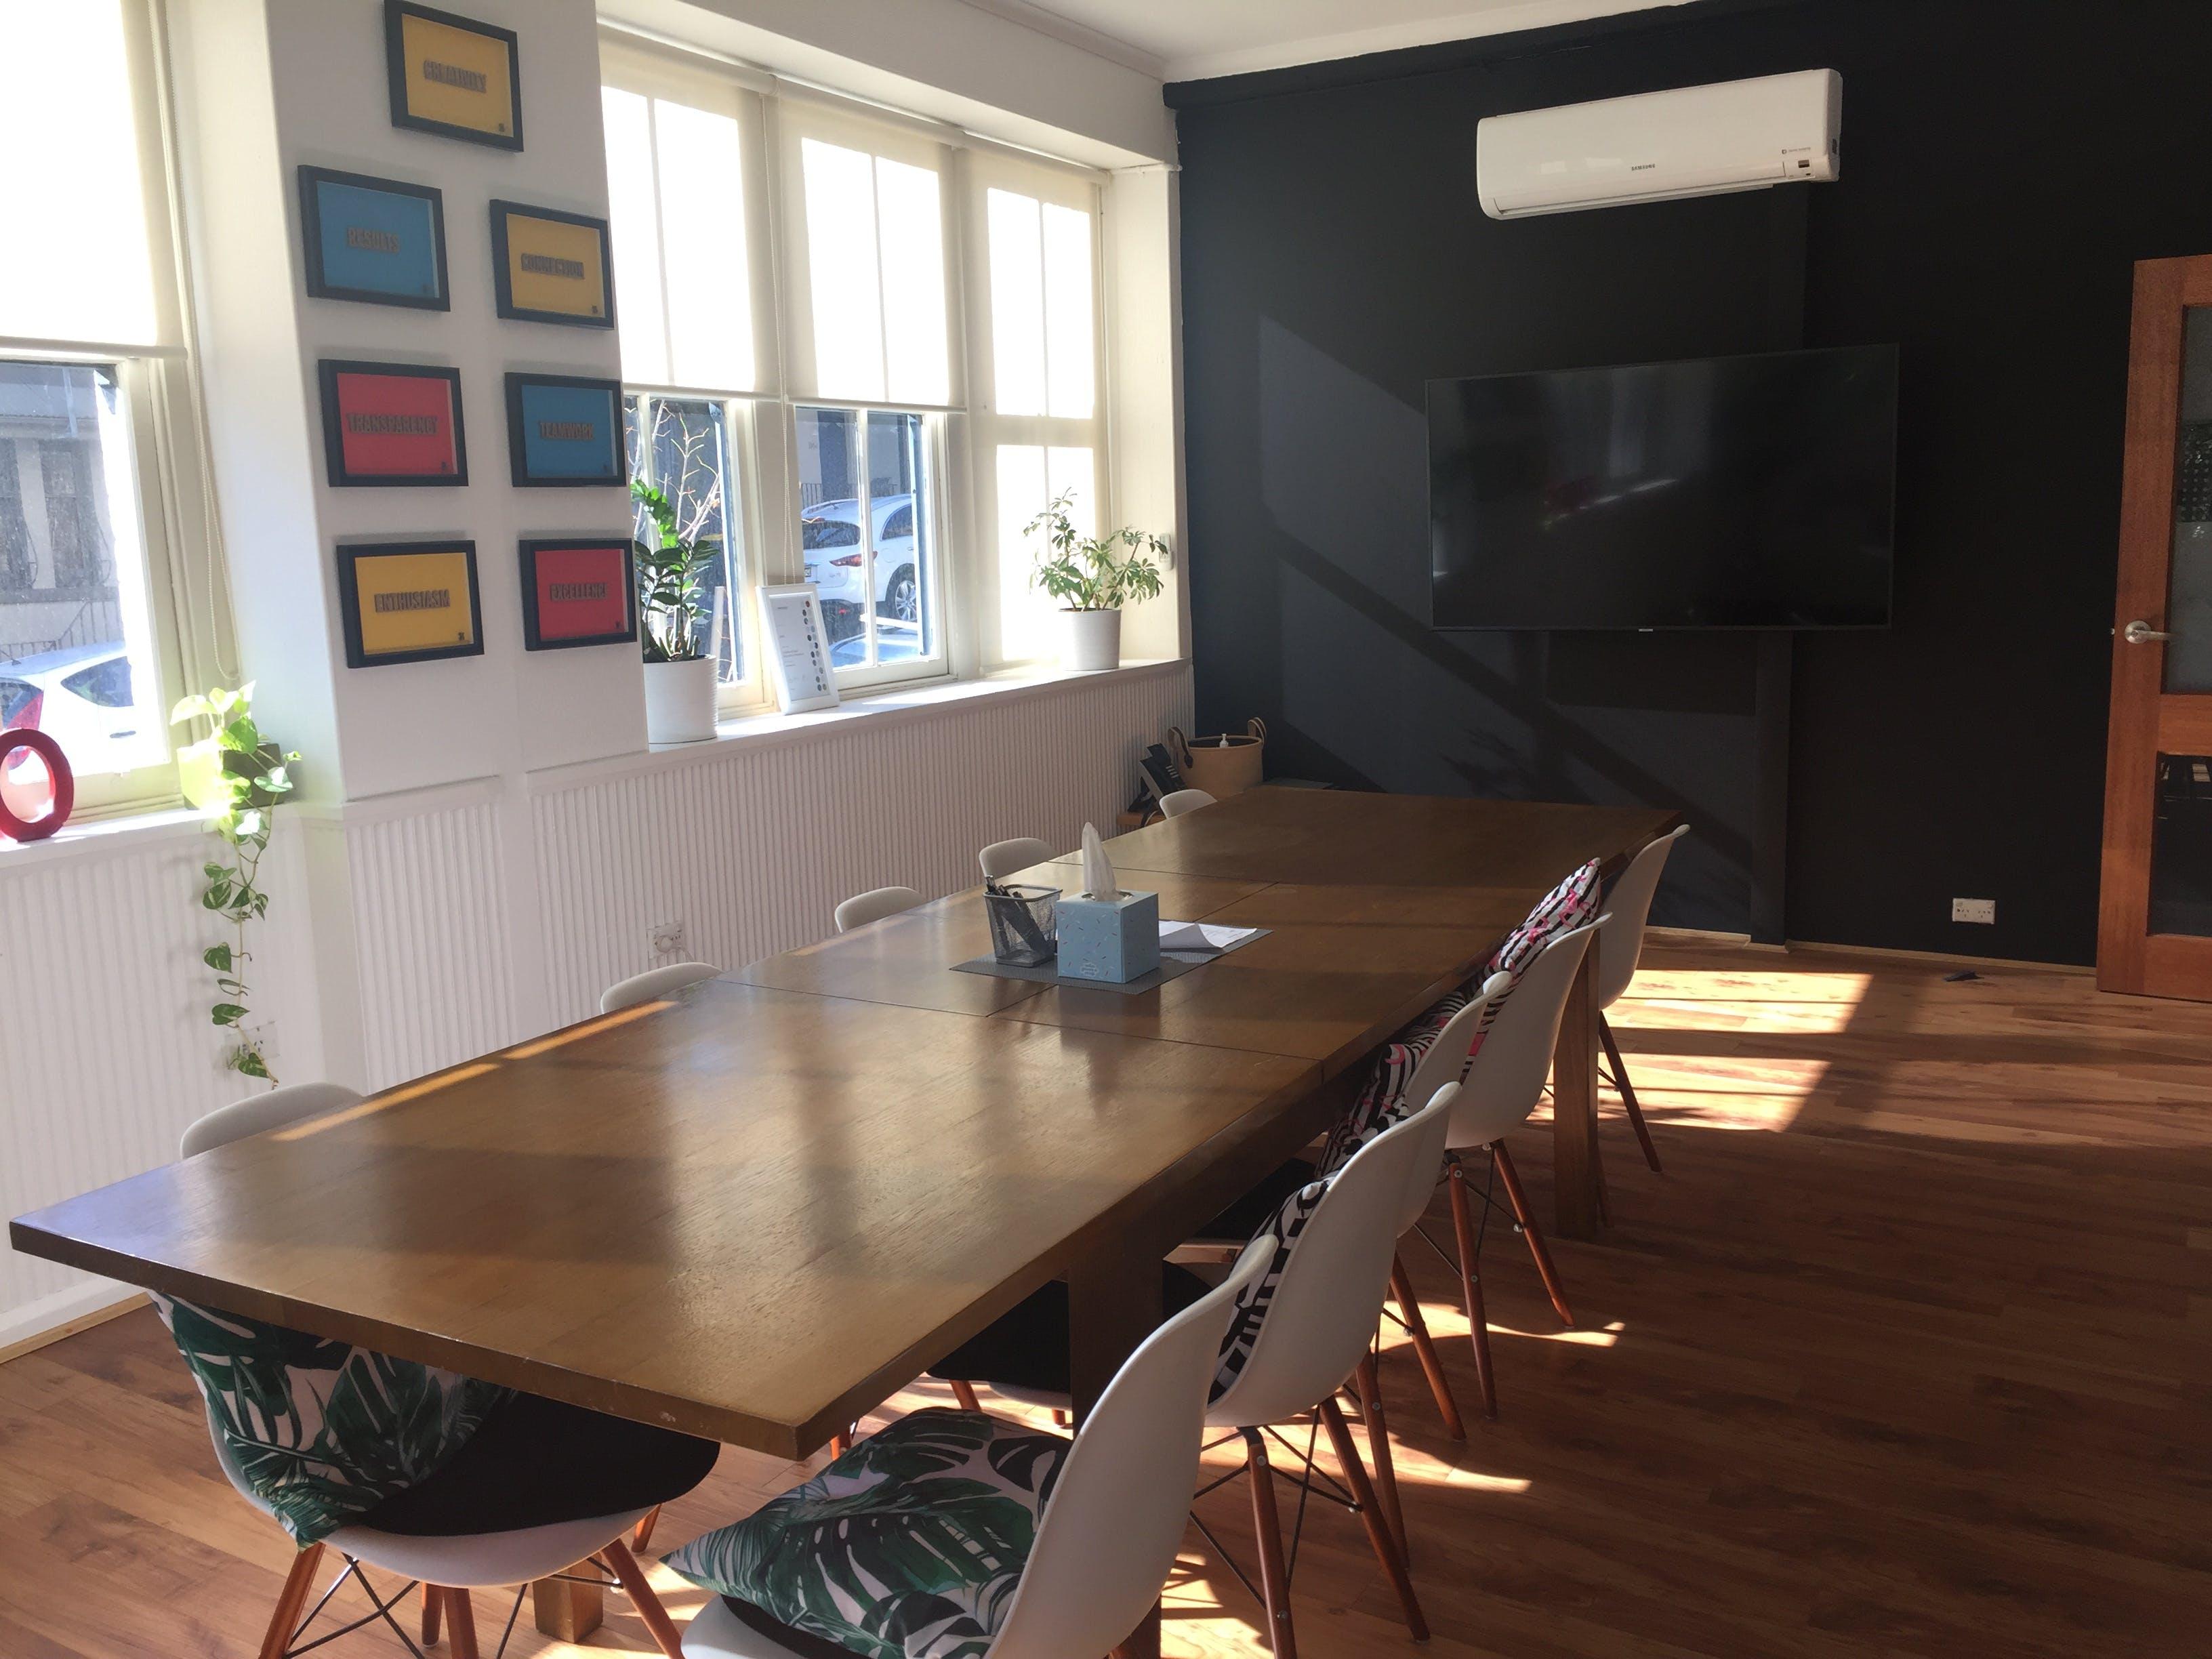 Board Room, meeting room at Zadro Agency, image 1